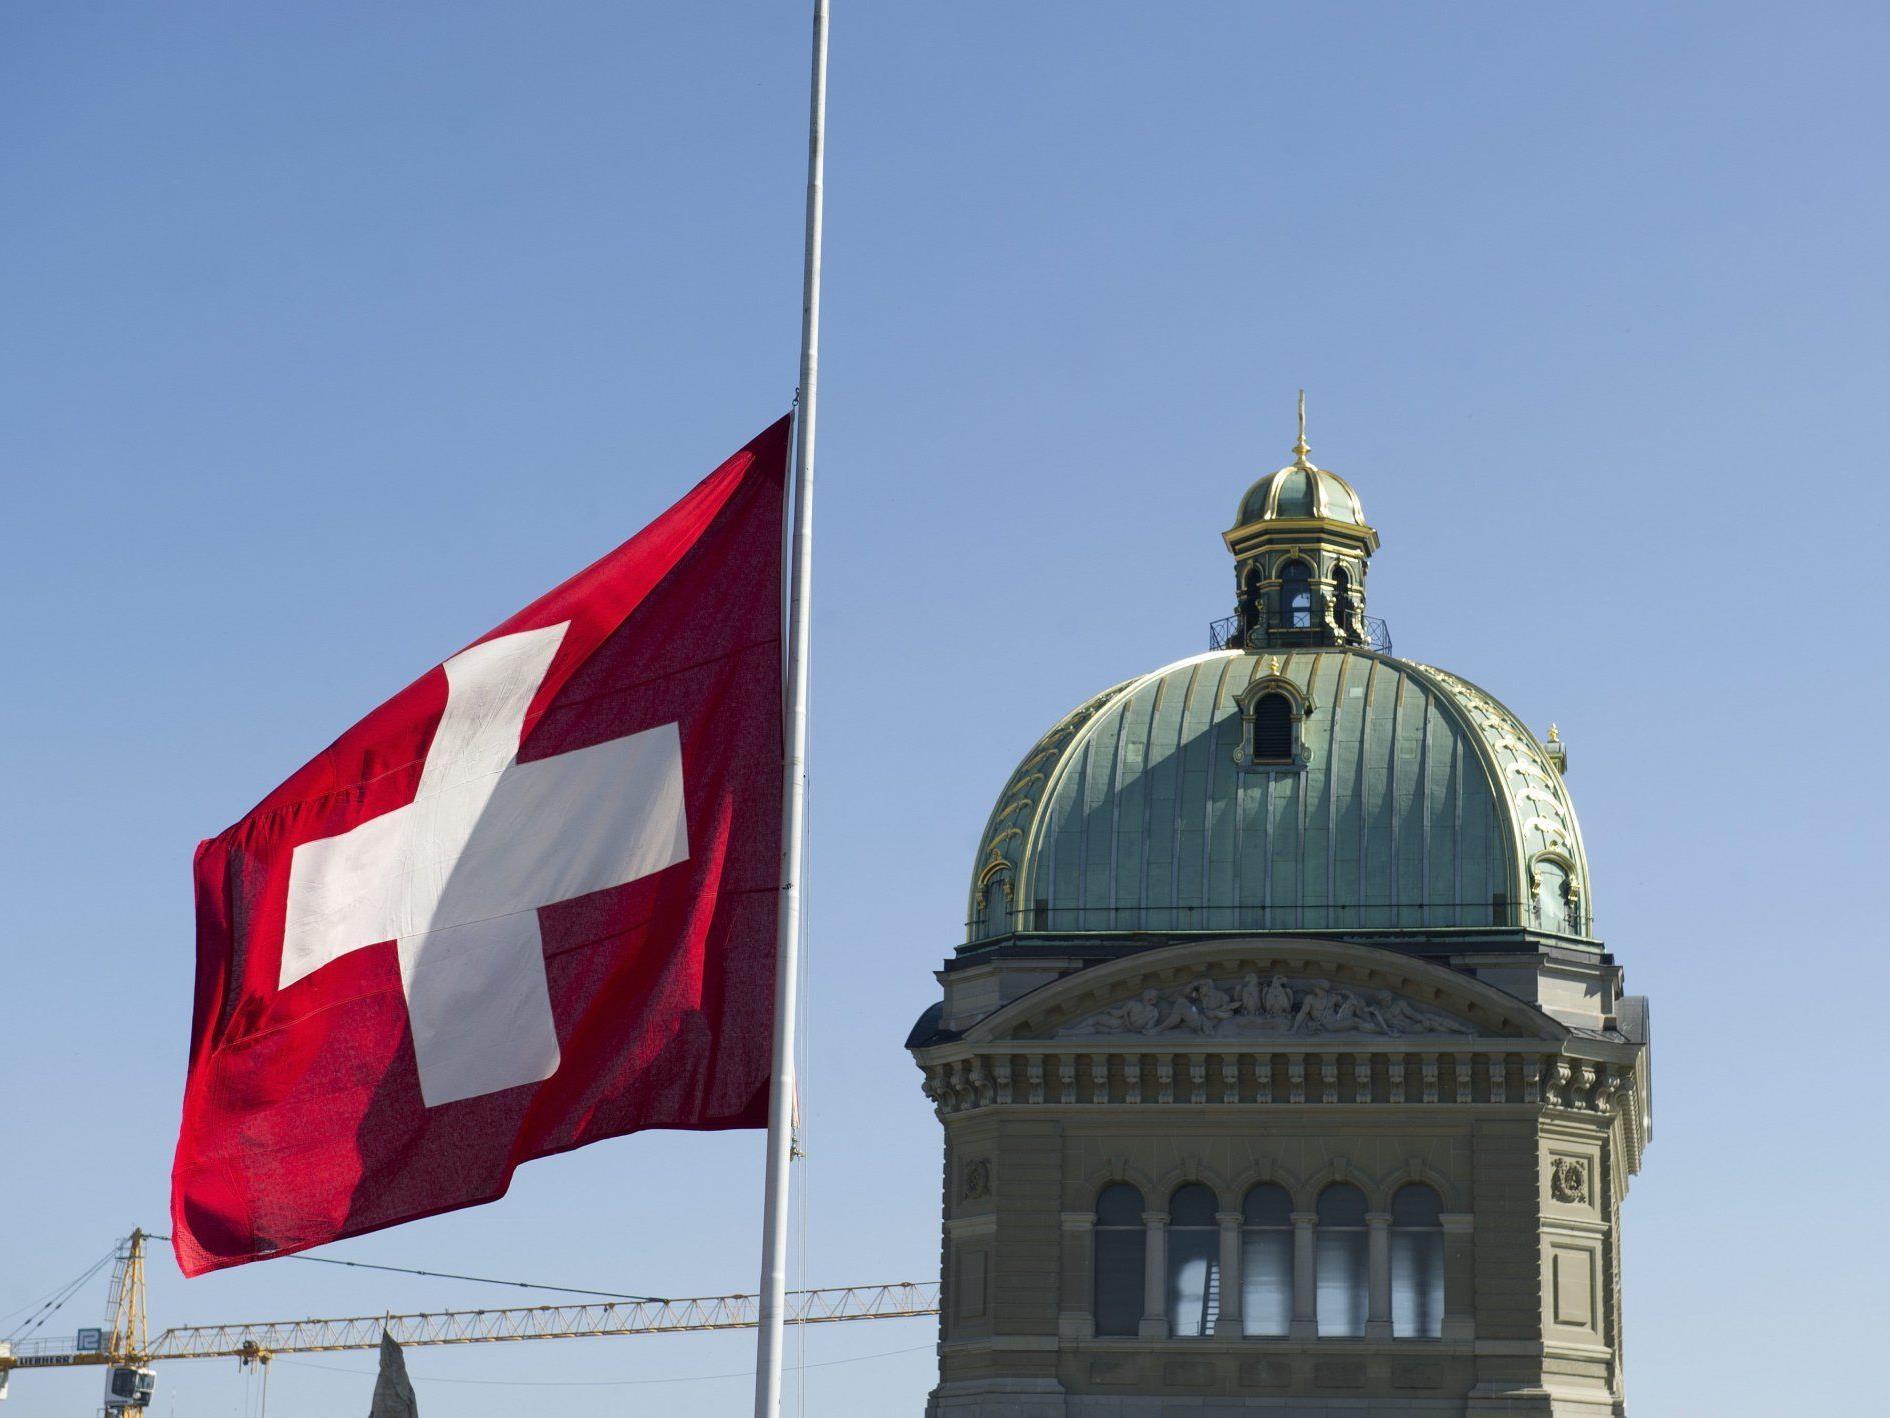 Schweiz: Familienasyl soll abgeschafft werden